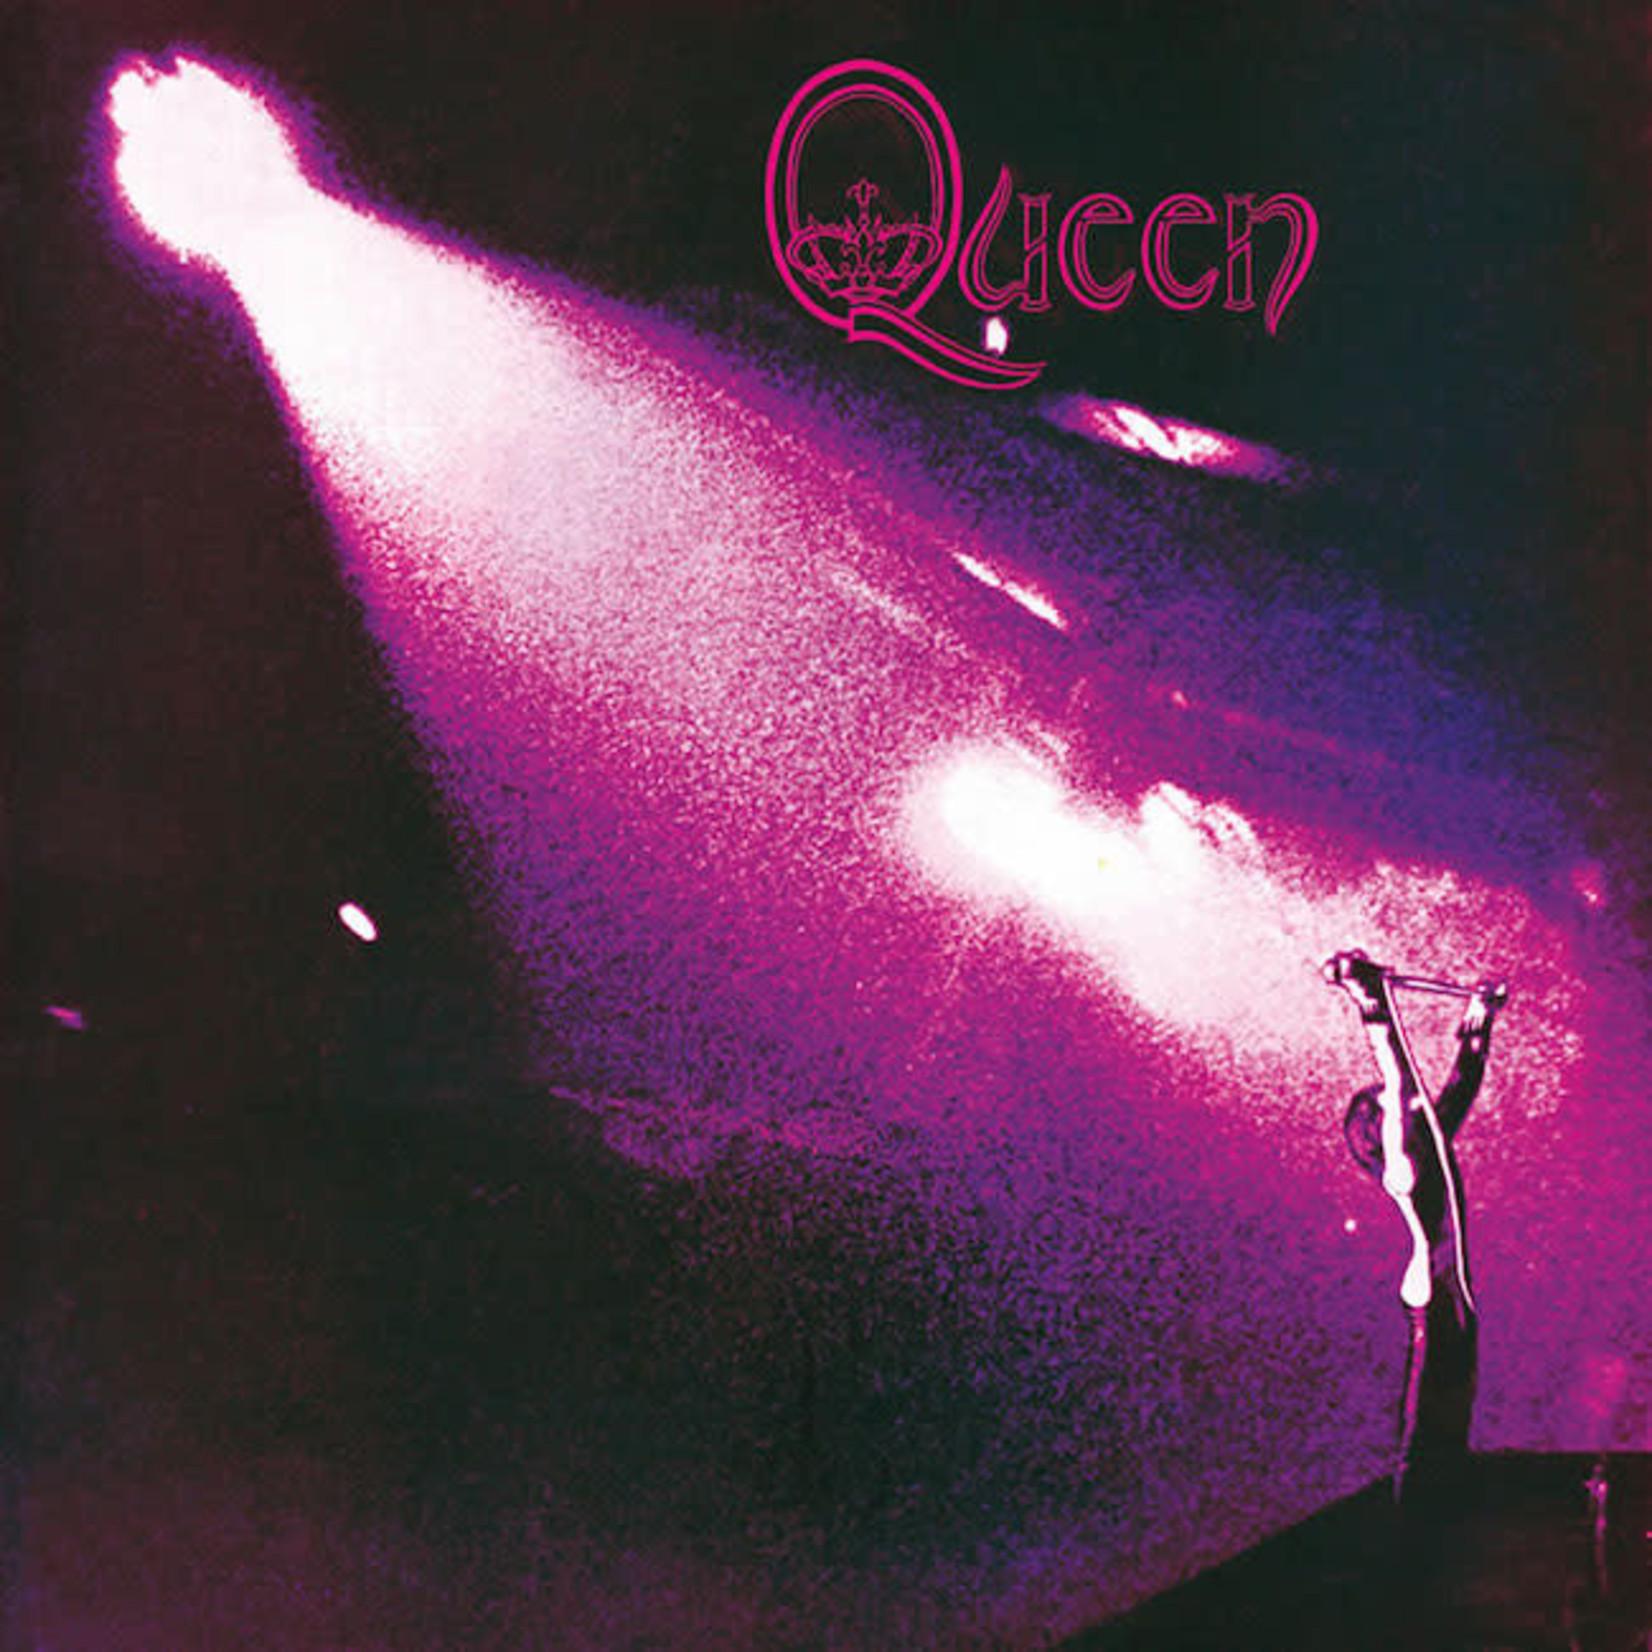 [Vintage] Queen: self-titled